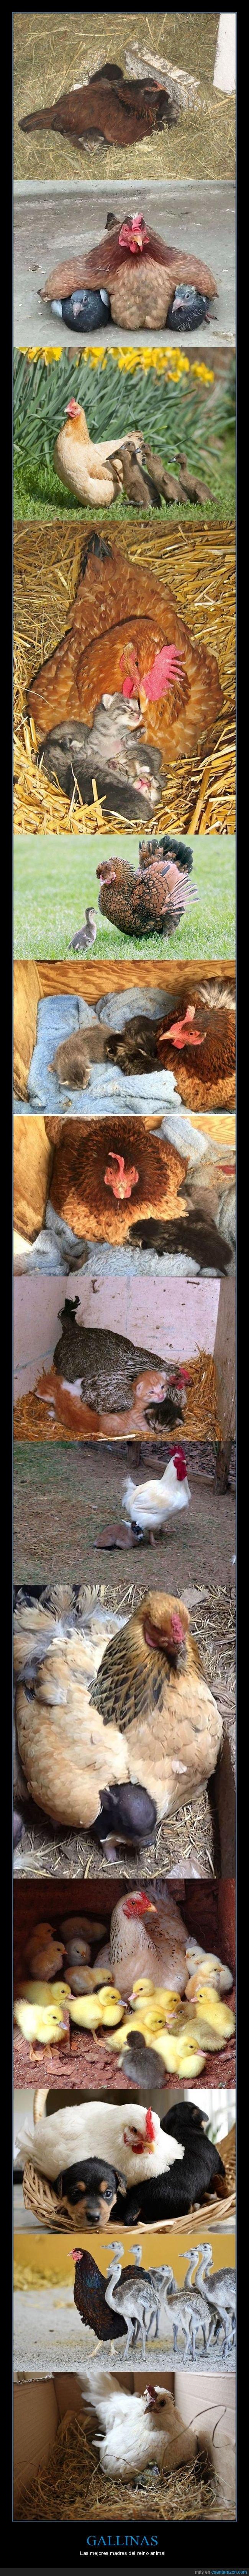 animales,gallinas,madres